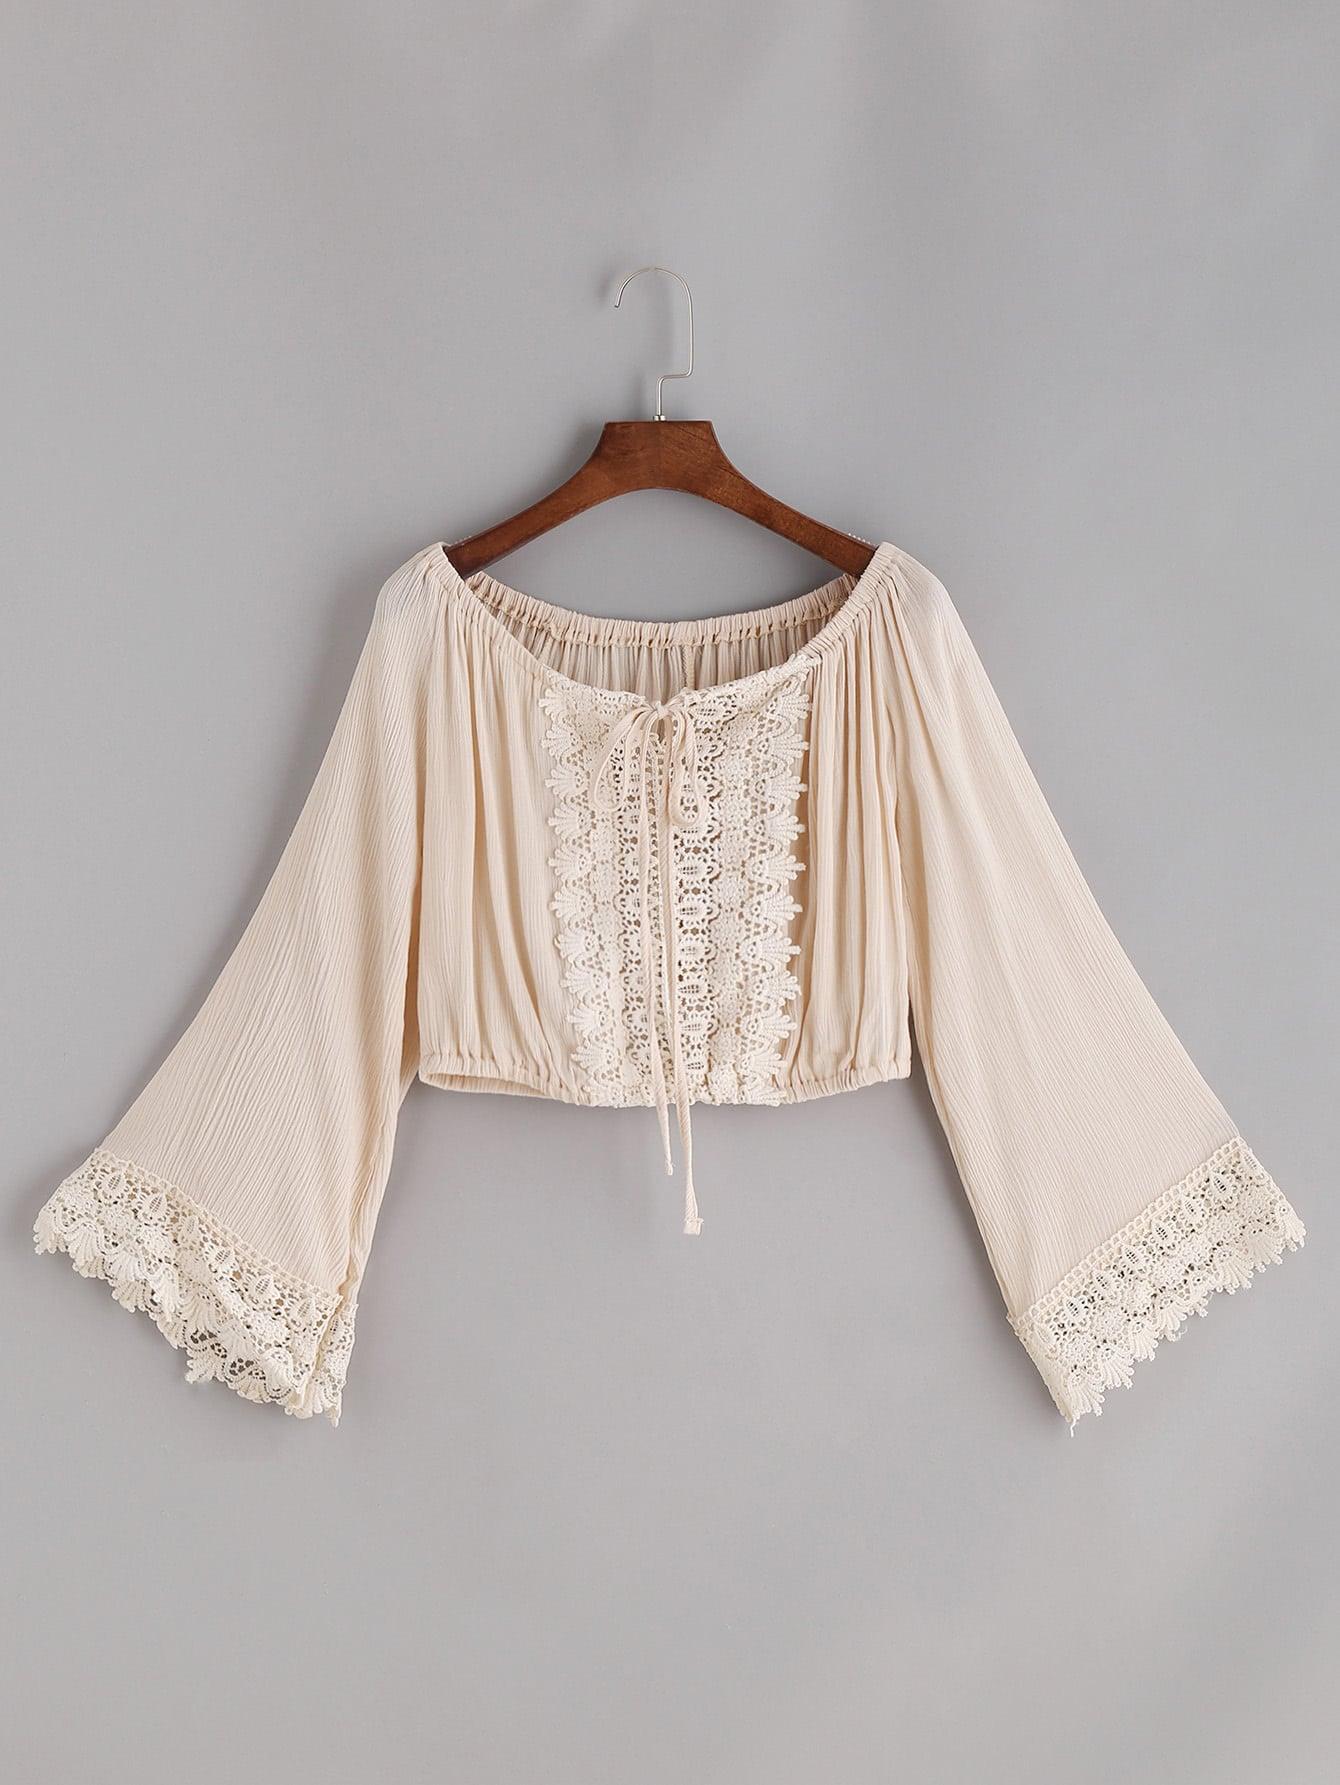 Boat Neckline Crochet Lace Trim Tie Top boat neckline striped blouse with buttons